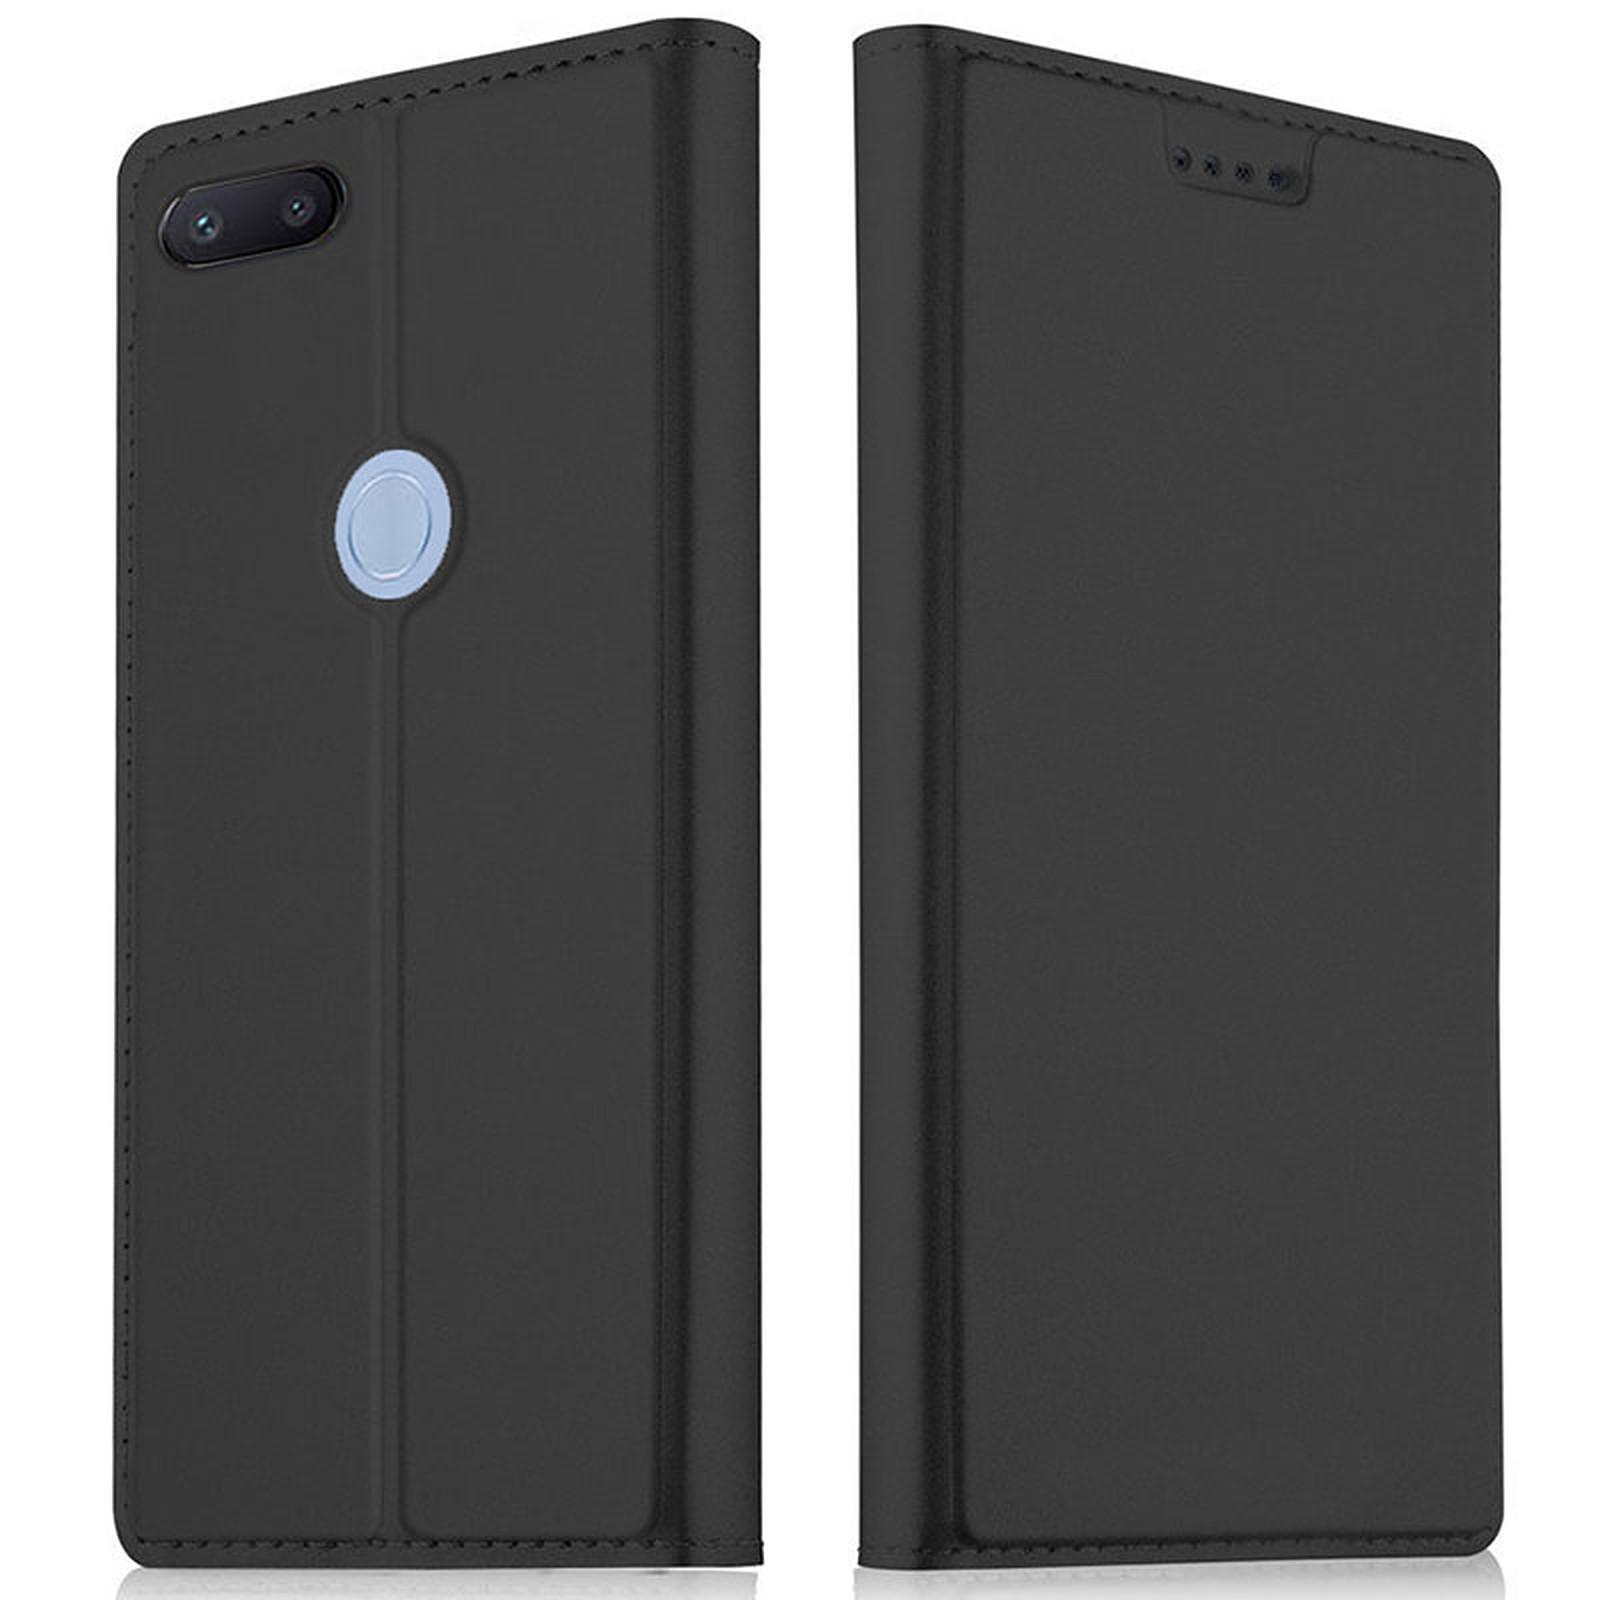 Akashi Etui Folio Porte Carte Noir Xiaomi Redmi 6